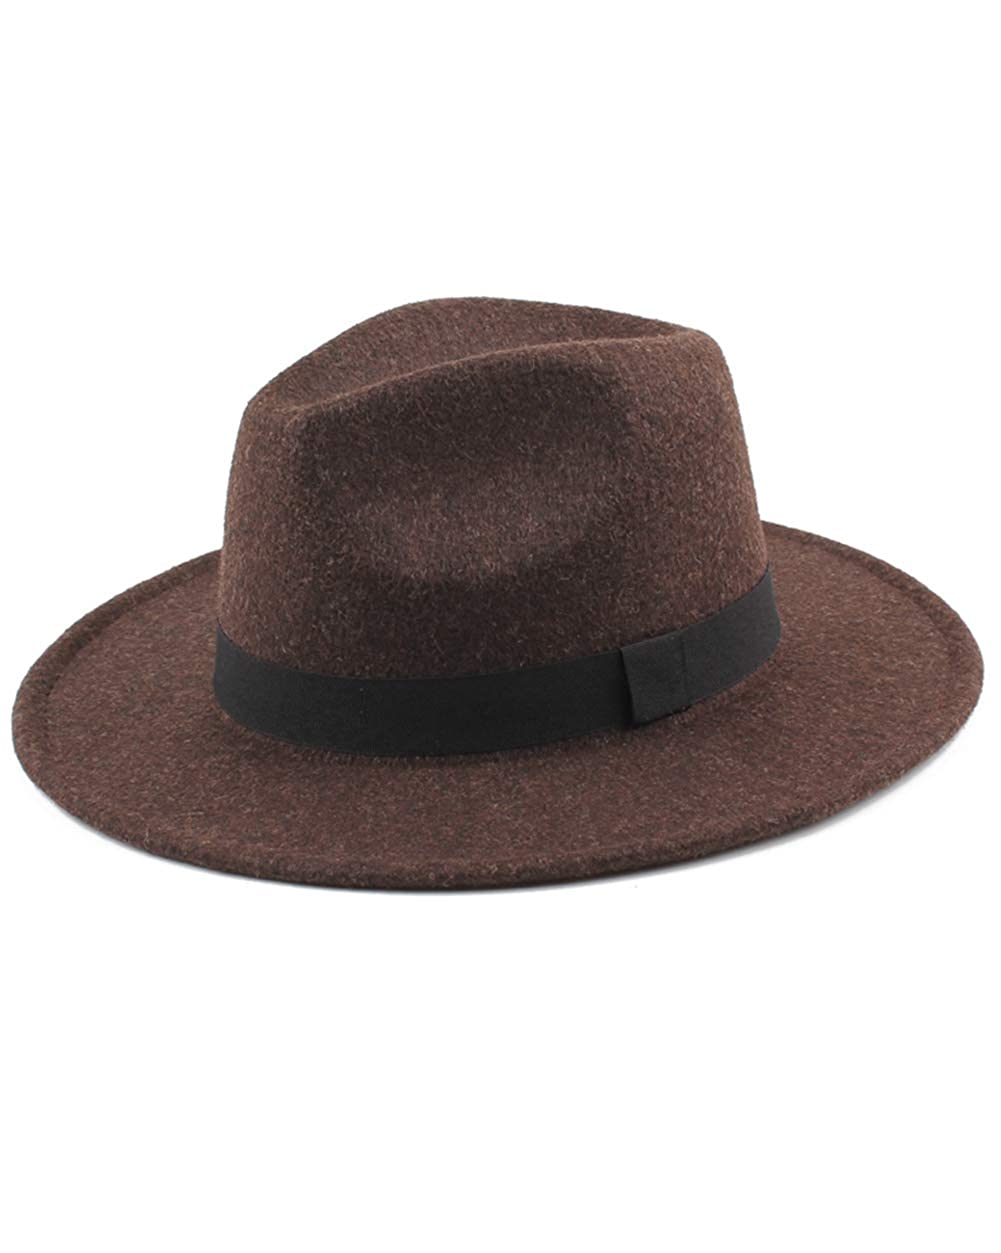 SANOMY Unisex Fedoras Hats Felt Trilby Hats Wide Brim Adjustable Fedora Jazz Caps